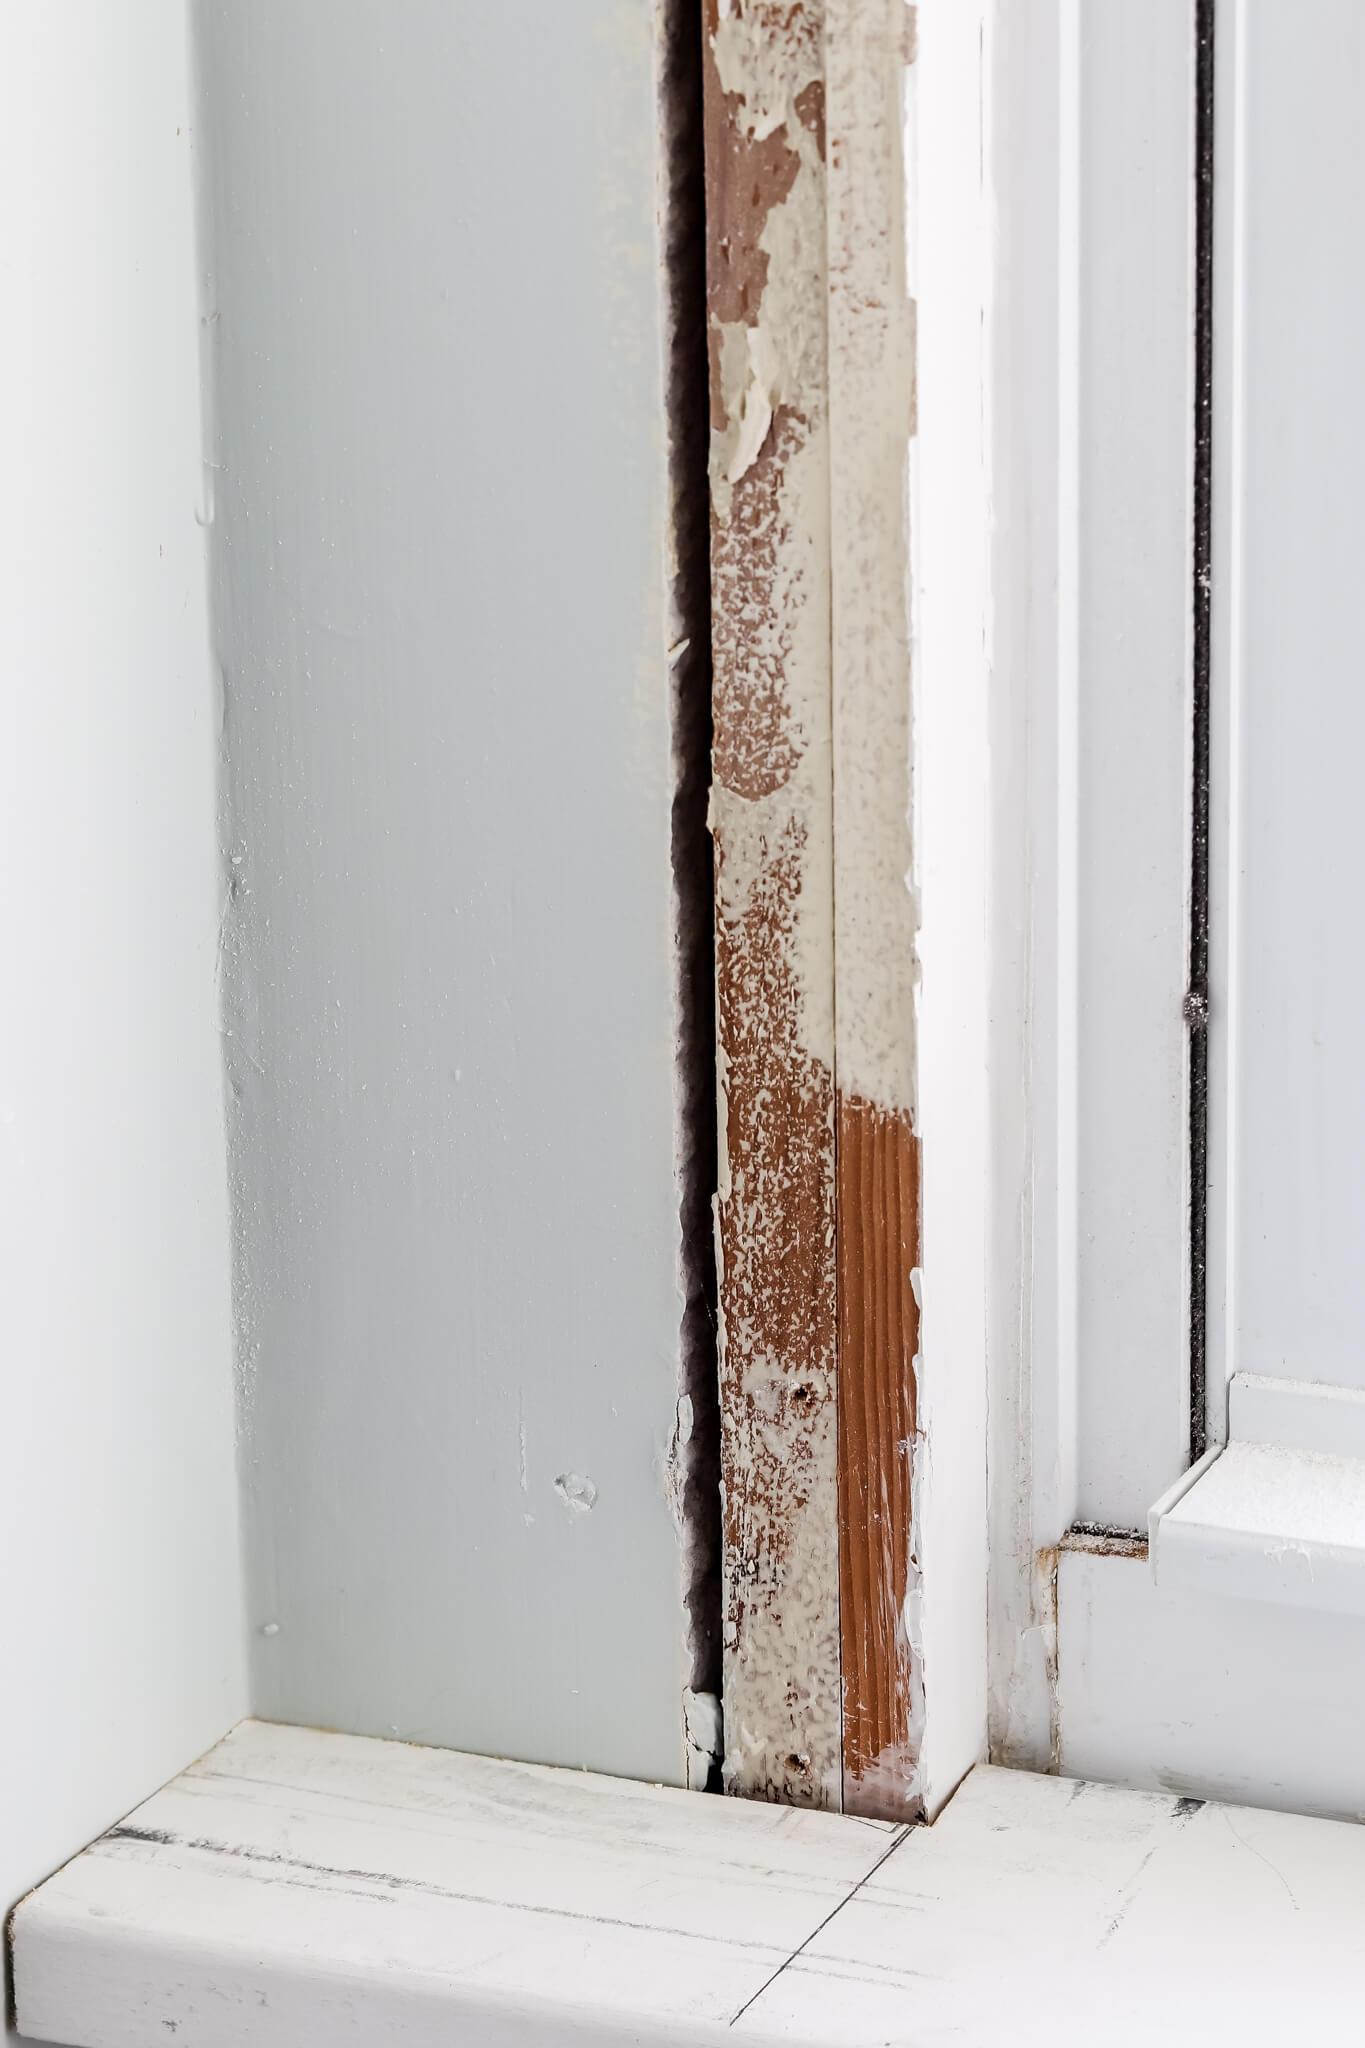 corner of wood craftsman style window trim